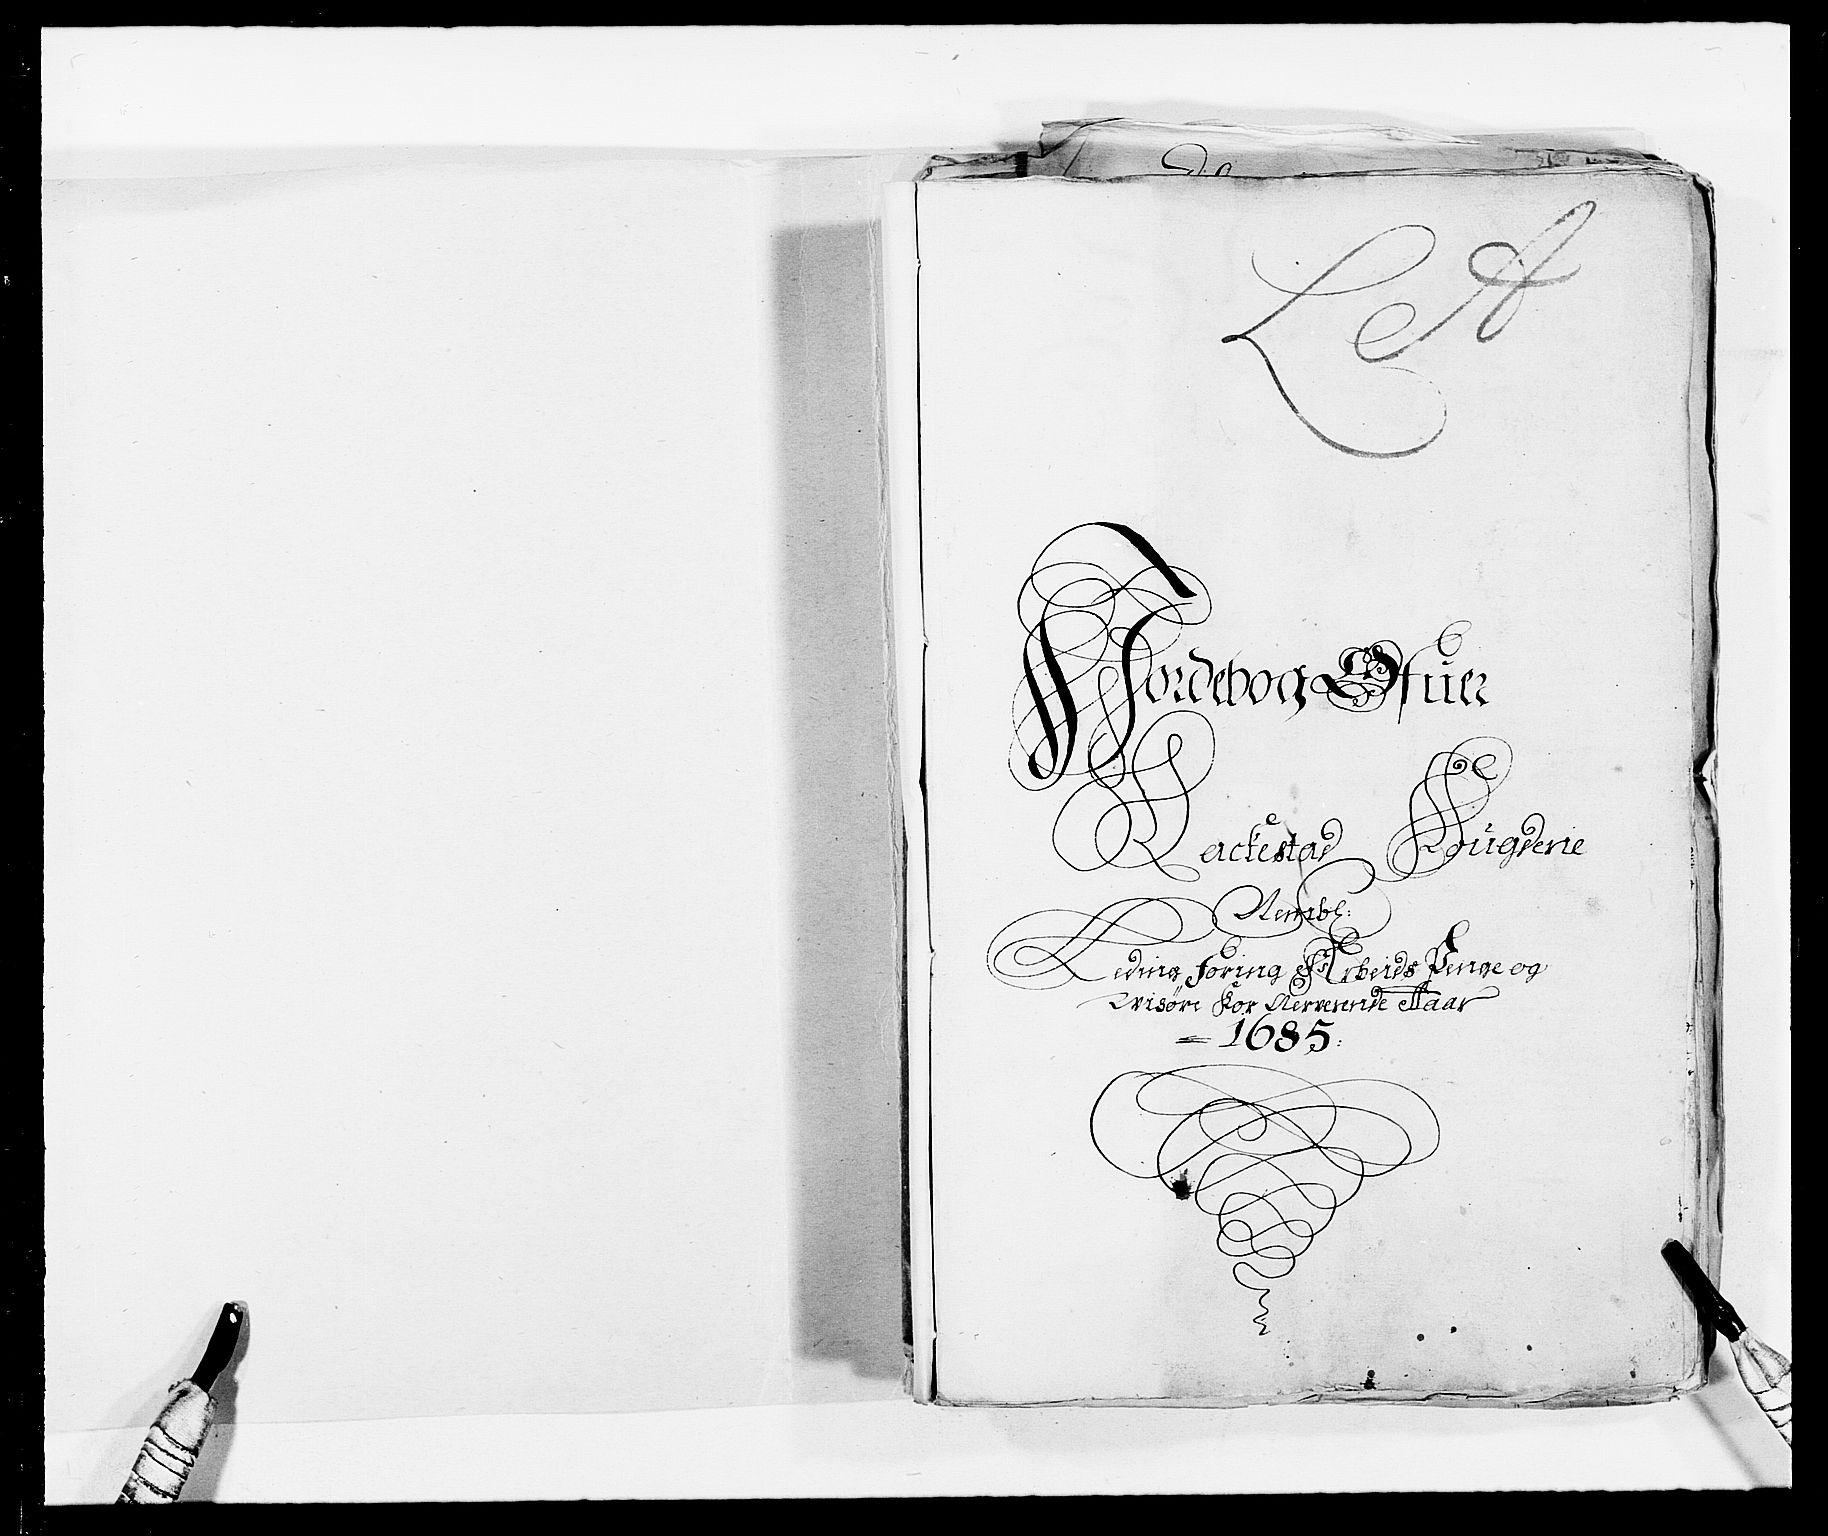 RA, Rentekammeret inntil 1814, Reviderte regnskaper, Fogderegnskap, R05/L0275: Fogderegnskap Rakkestad, 1685-1686, s. 2